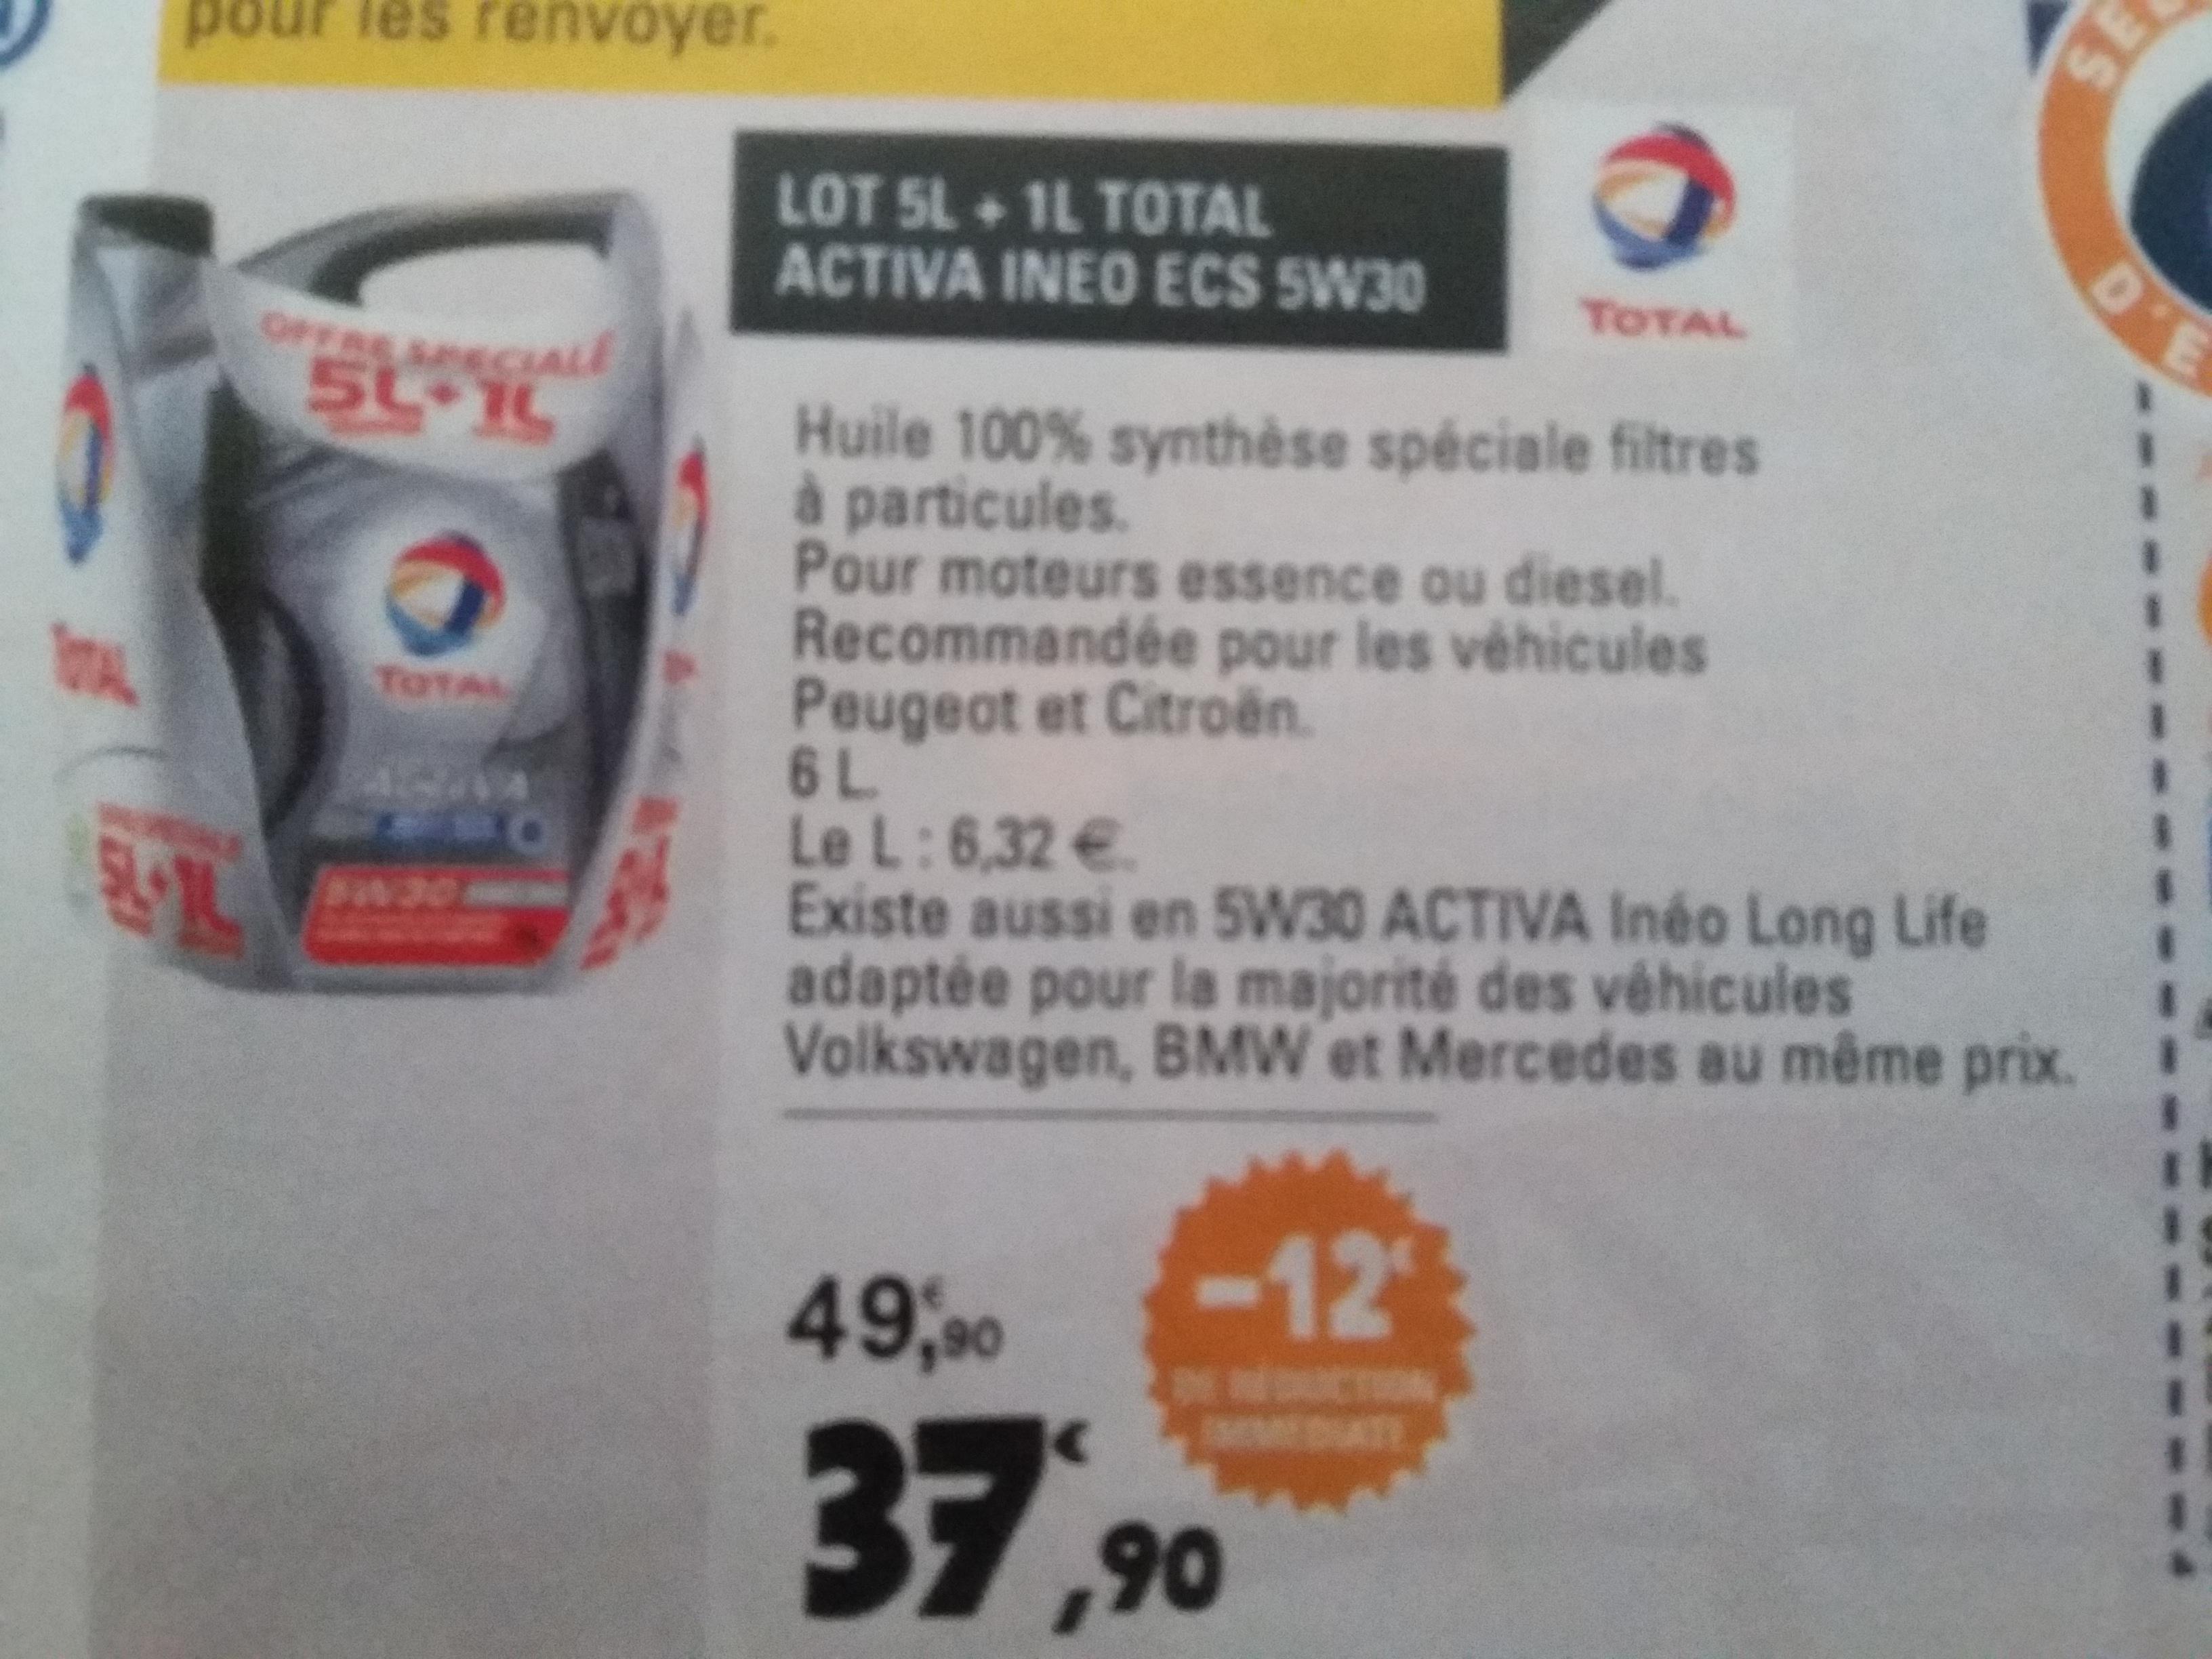 huile Total Ineo Ecs 5W30 5L + 1L